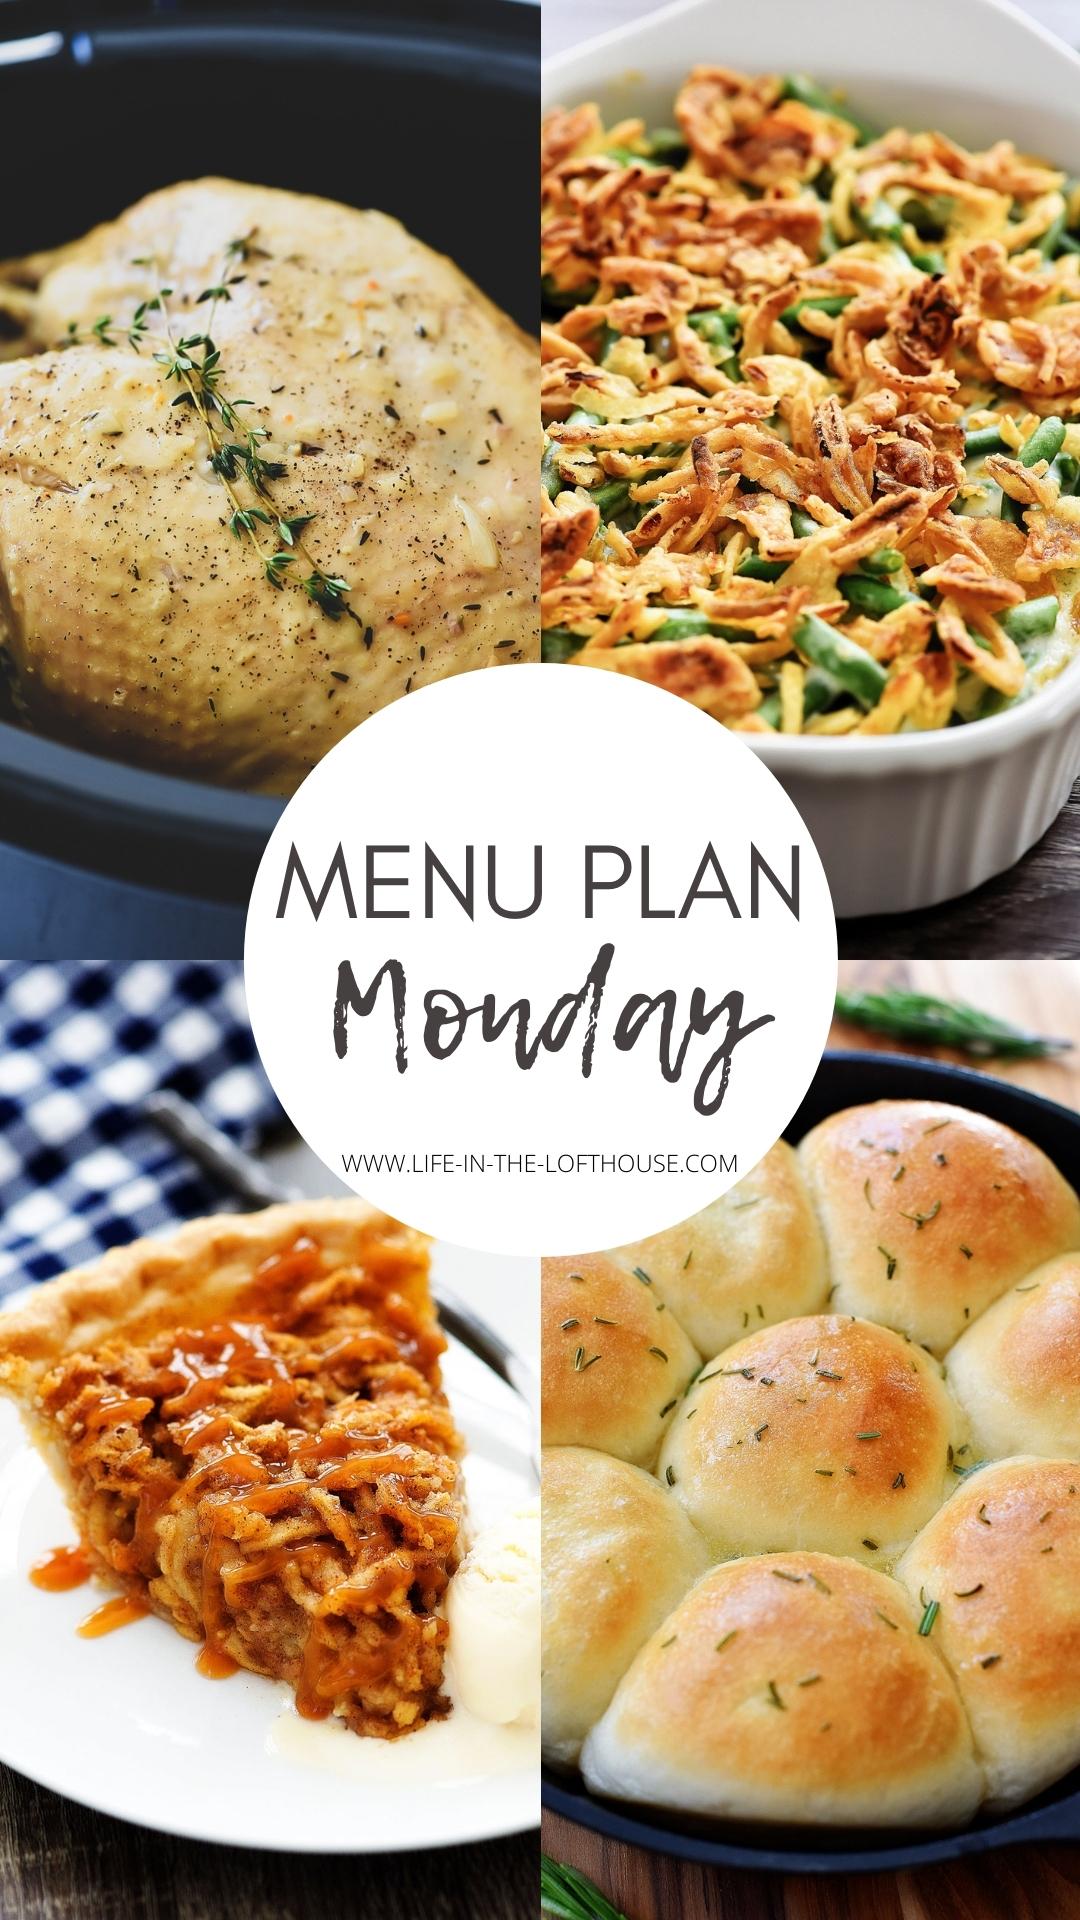 Thanksgiving Menu Plan Monday. Life-in-the-Lofthouse.com